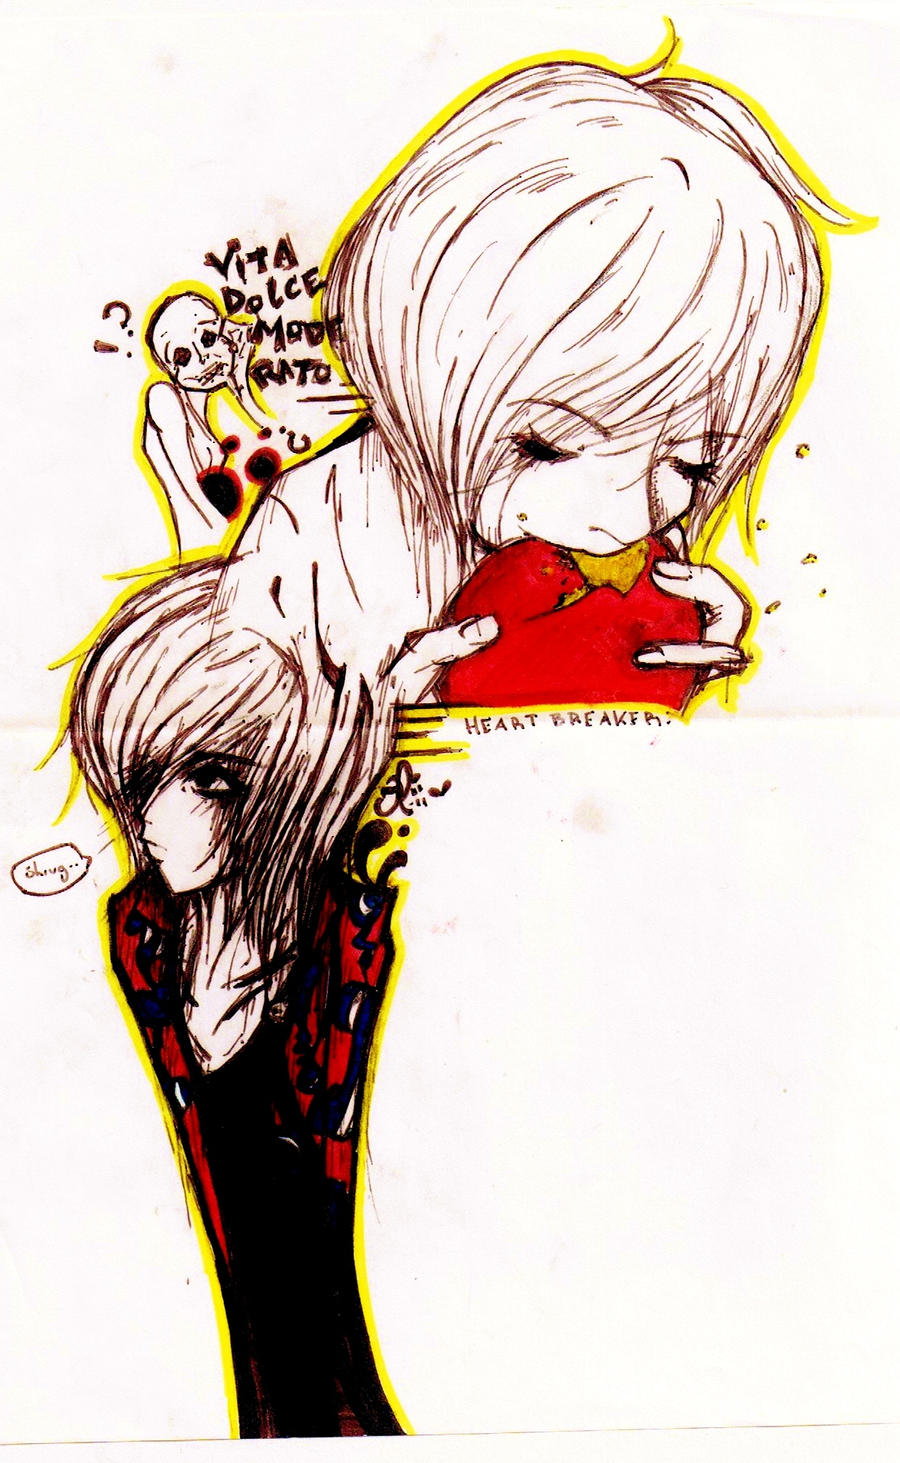 G Dragon Heartbreaker Wallpaper Go : G-Dragon Heartbre...